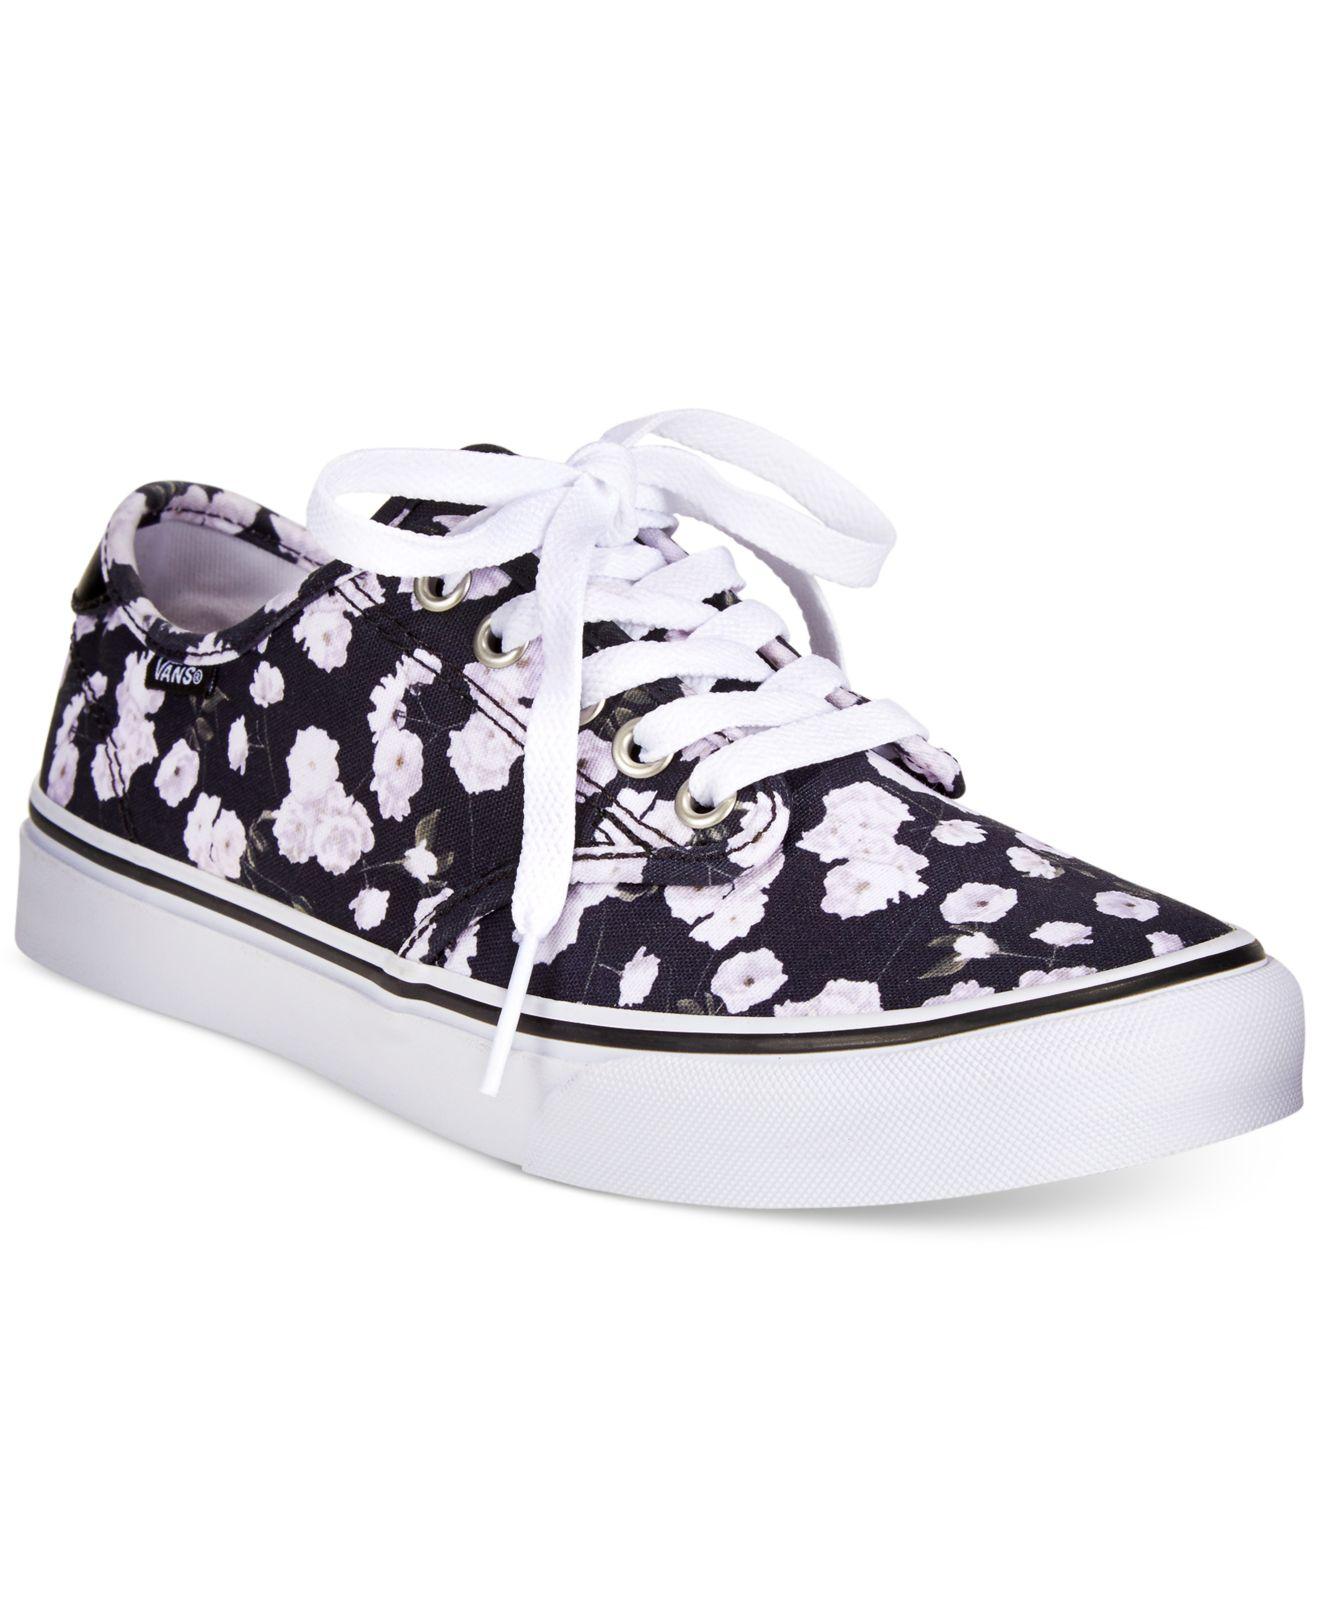 47c0a74d35 Lyst - Vans Women s Camden Floral Sneakers in White